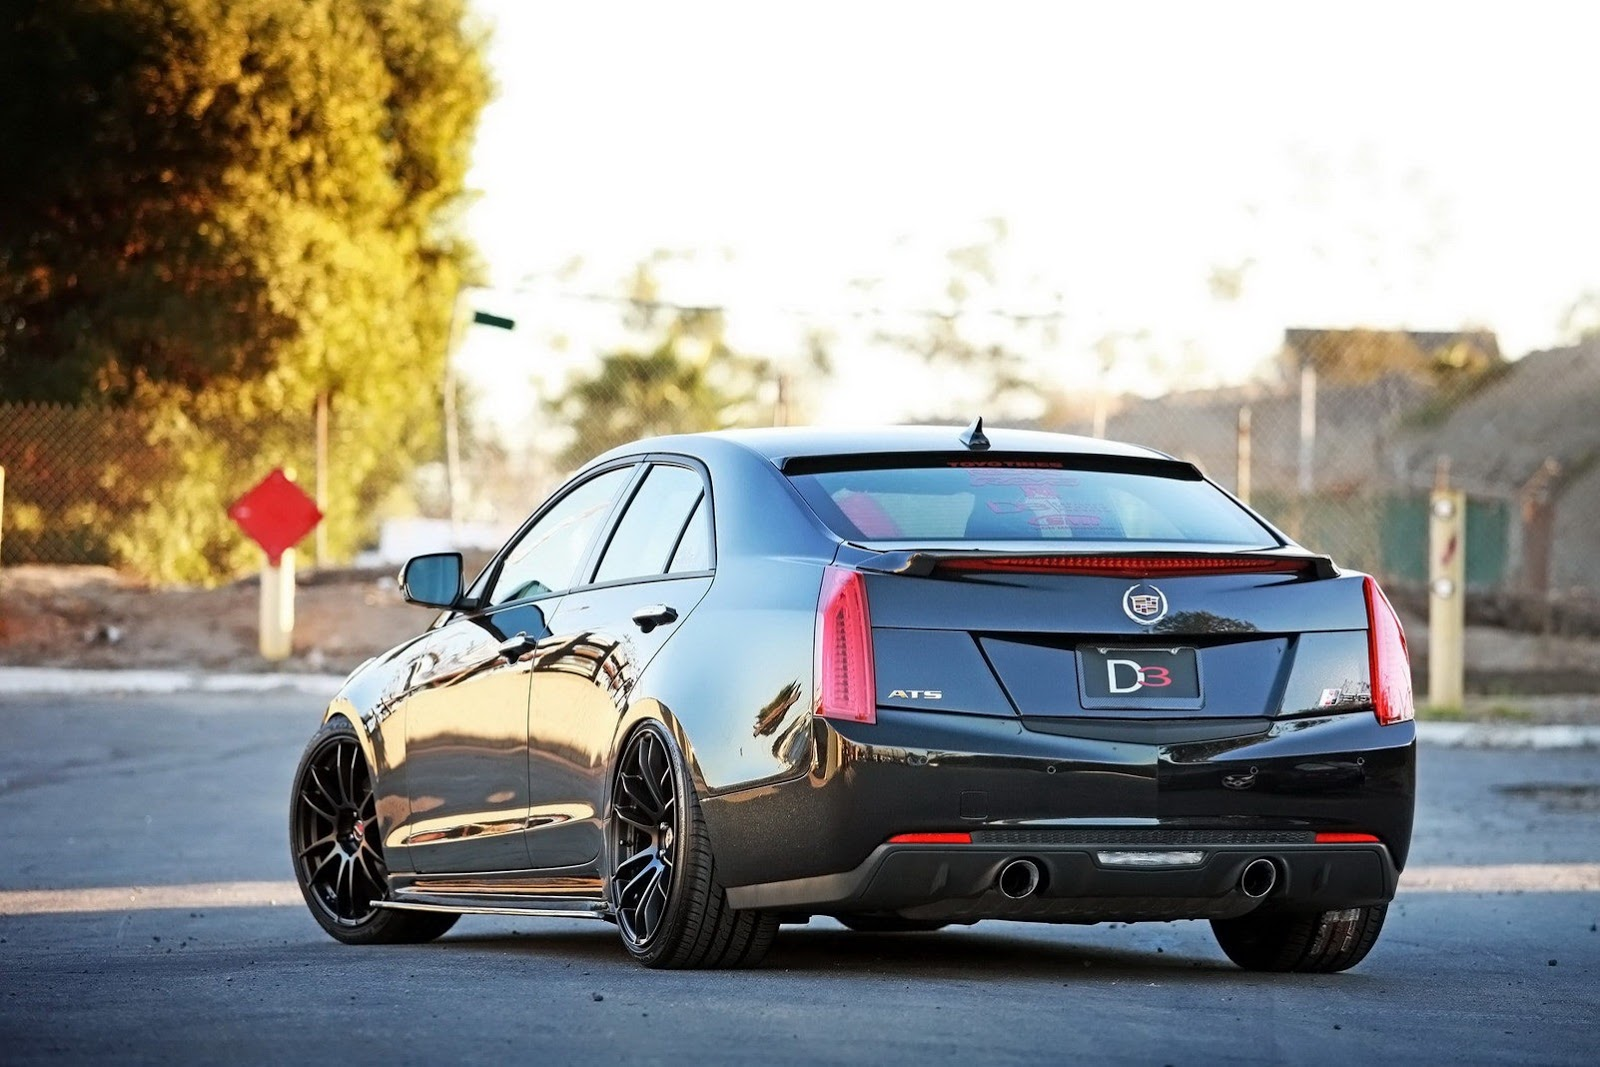 2013 Cadillac Ats Engines 270 Hp 2 0l Turbo 2 5l And 3